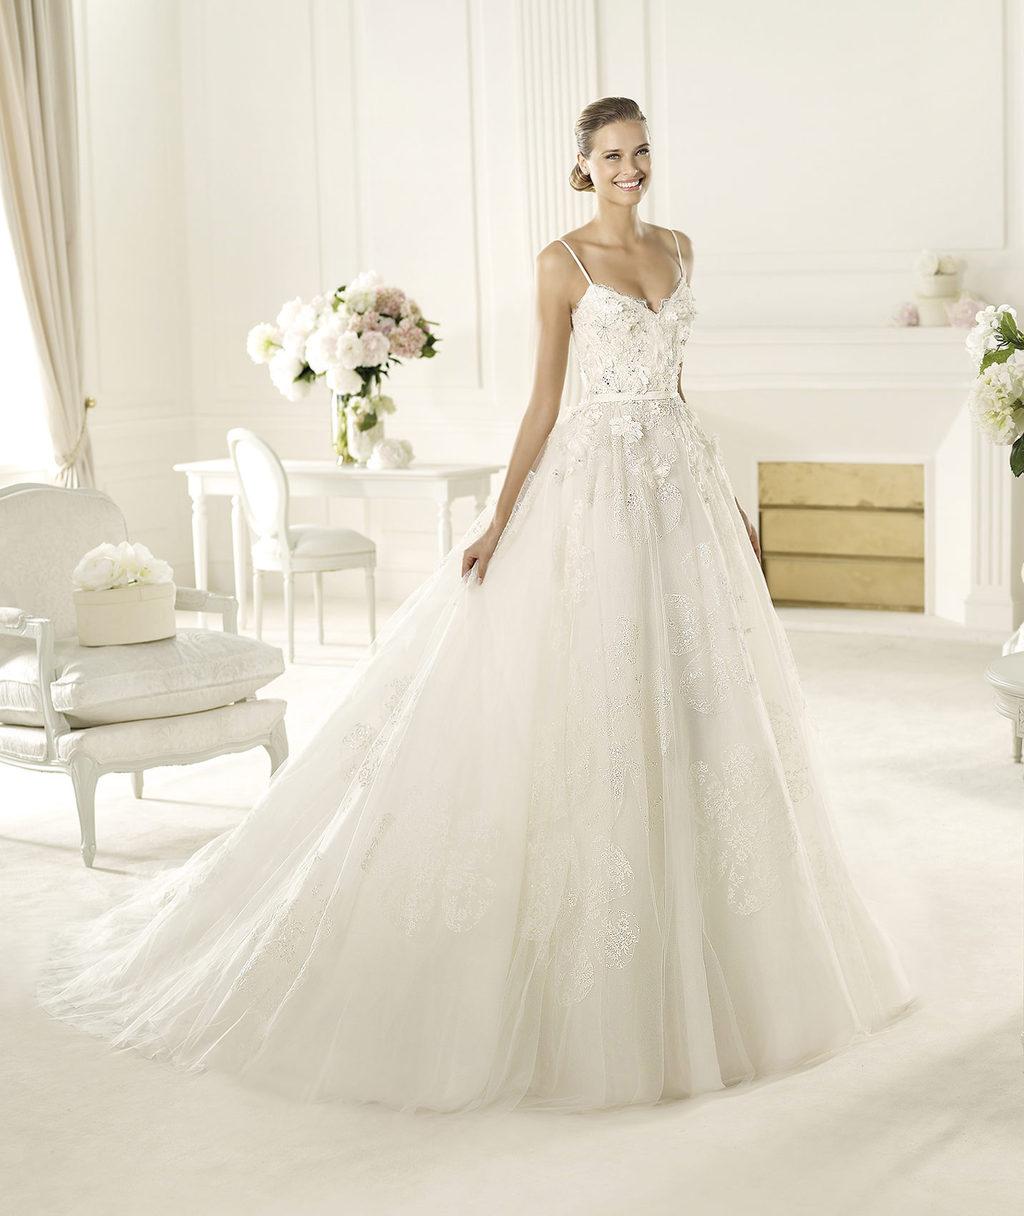 Dione-wedding-dress-by-elie-saab-for-pronovias.full